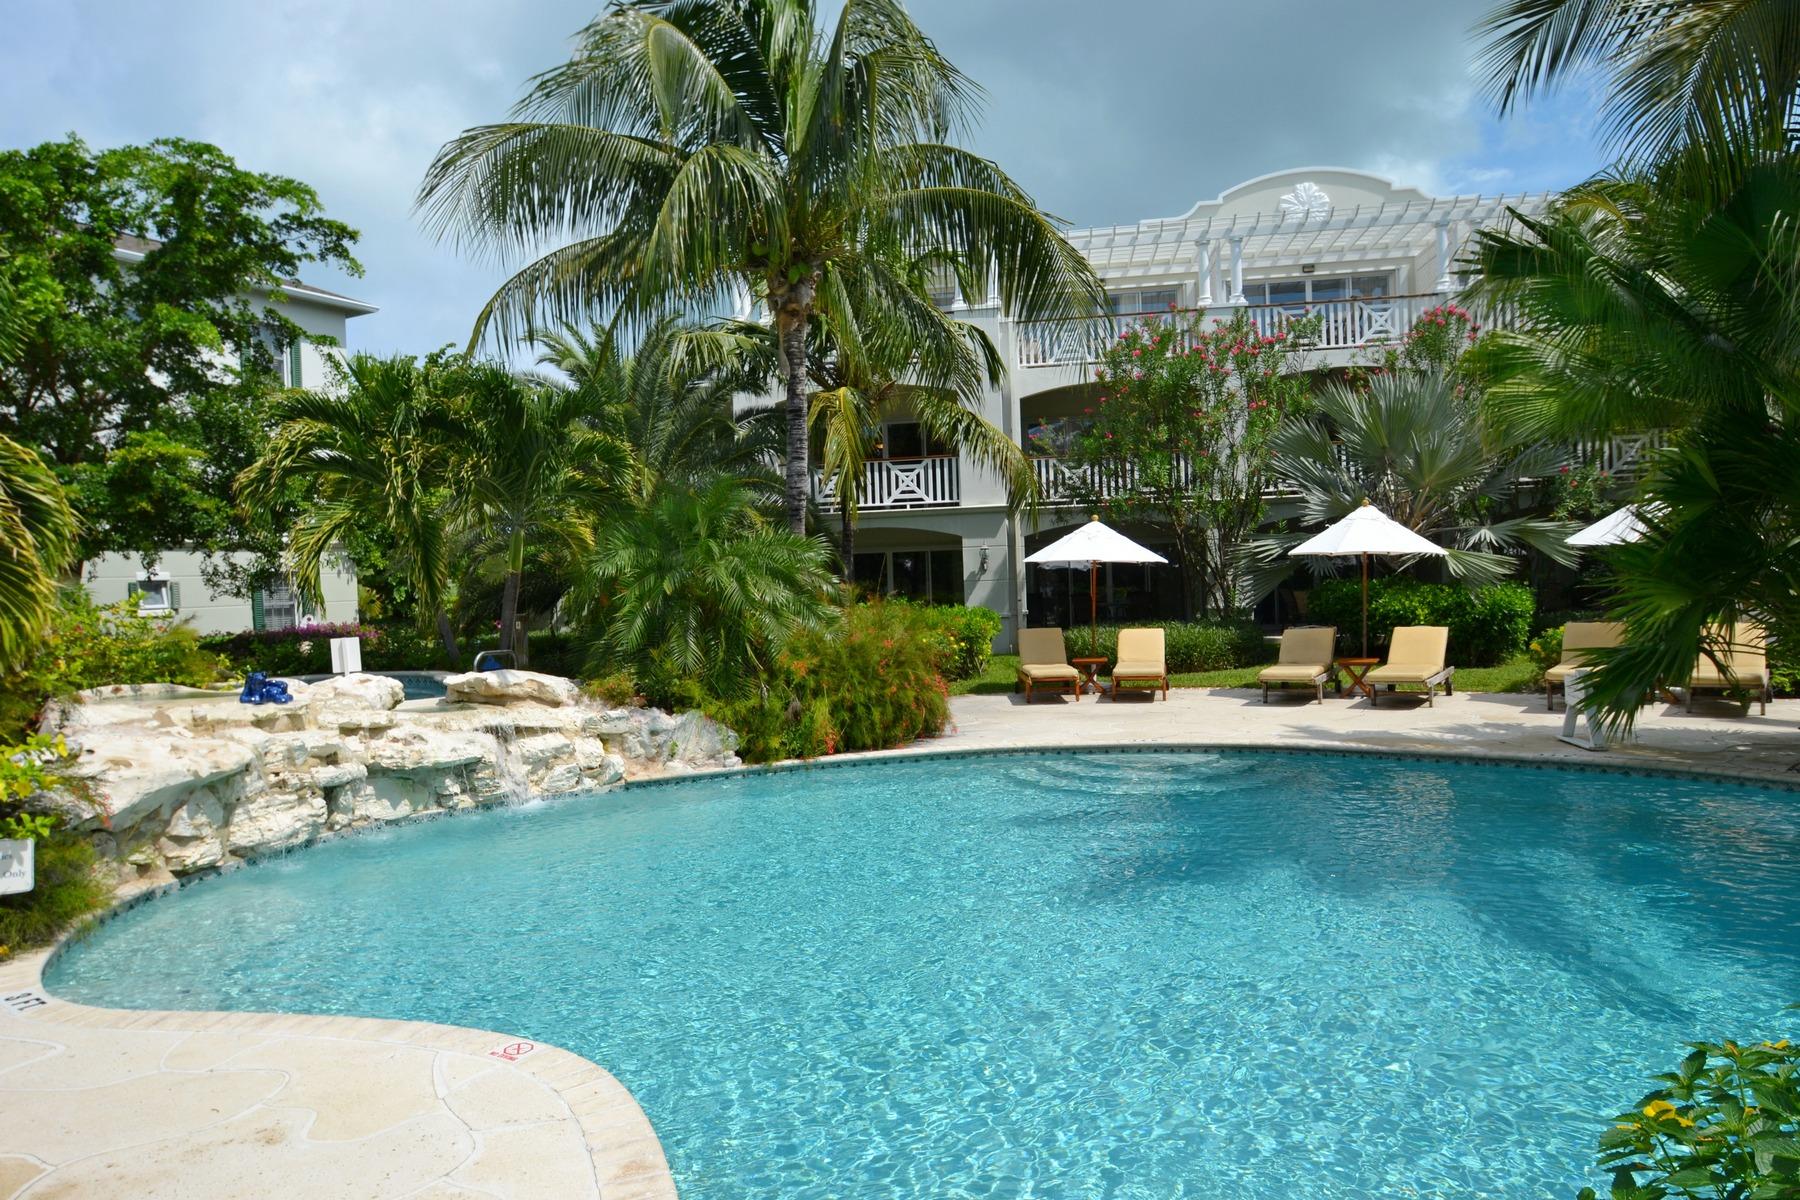 Condomínio para Venda às Royal West Indies - Suite 833 Beachfront Grace Bay, Providenciales TCI Turks E Caicos